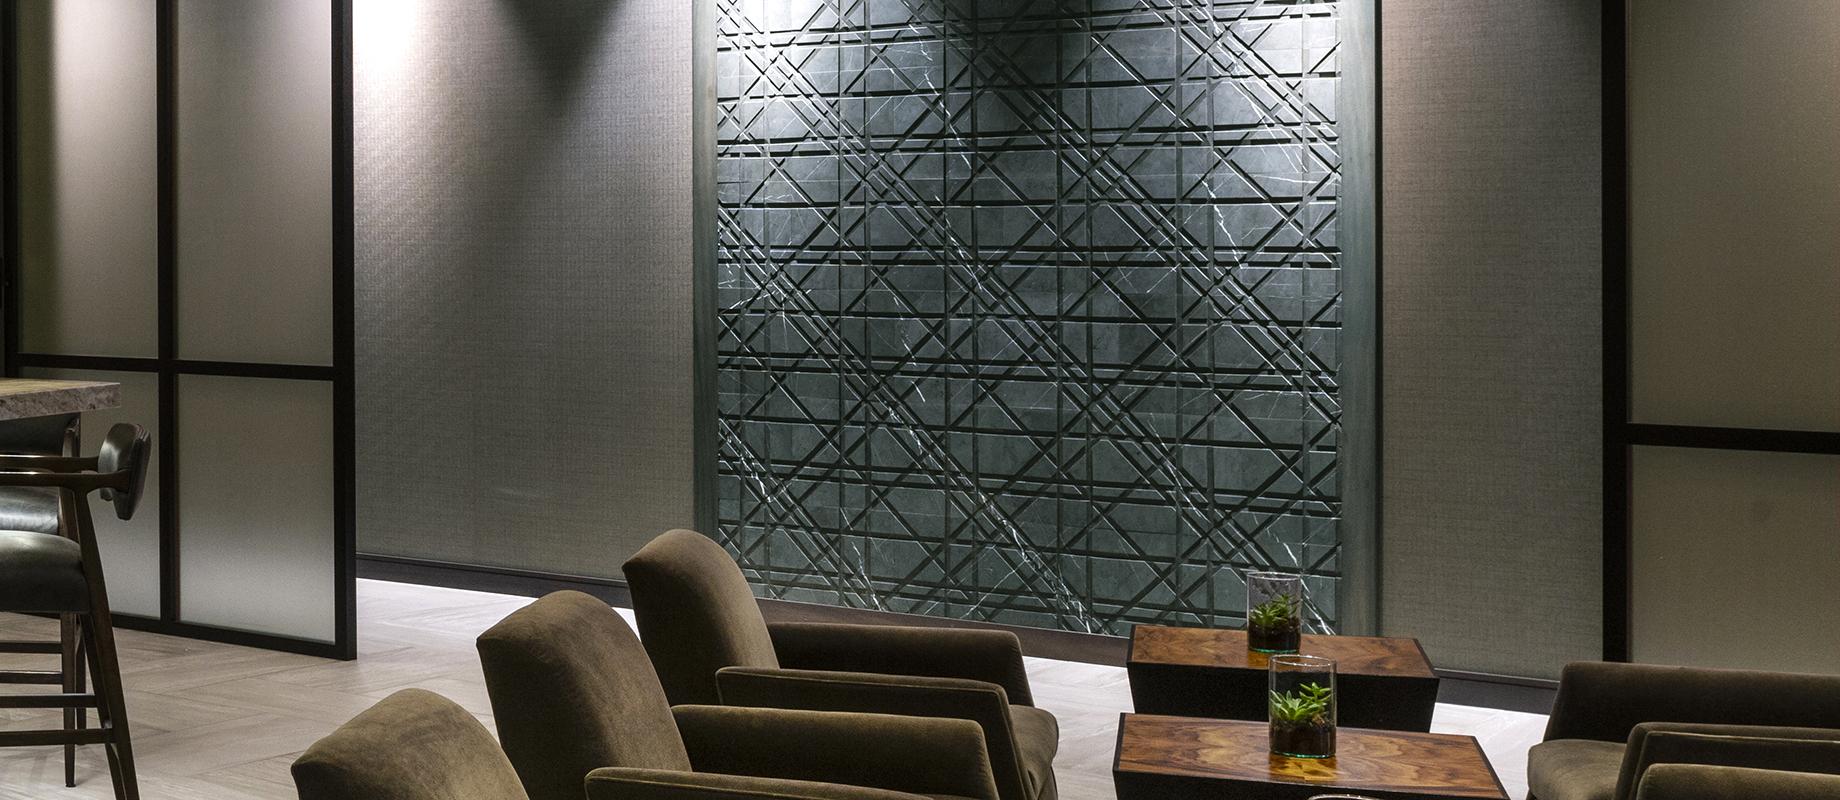 LithosDesign_ACHotelCleveland_tartan_hotel interior wall covering